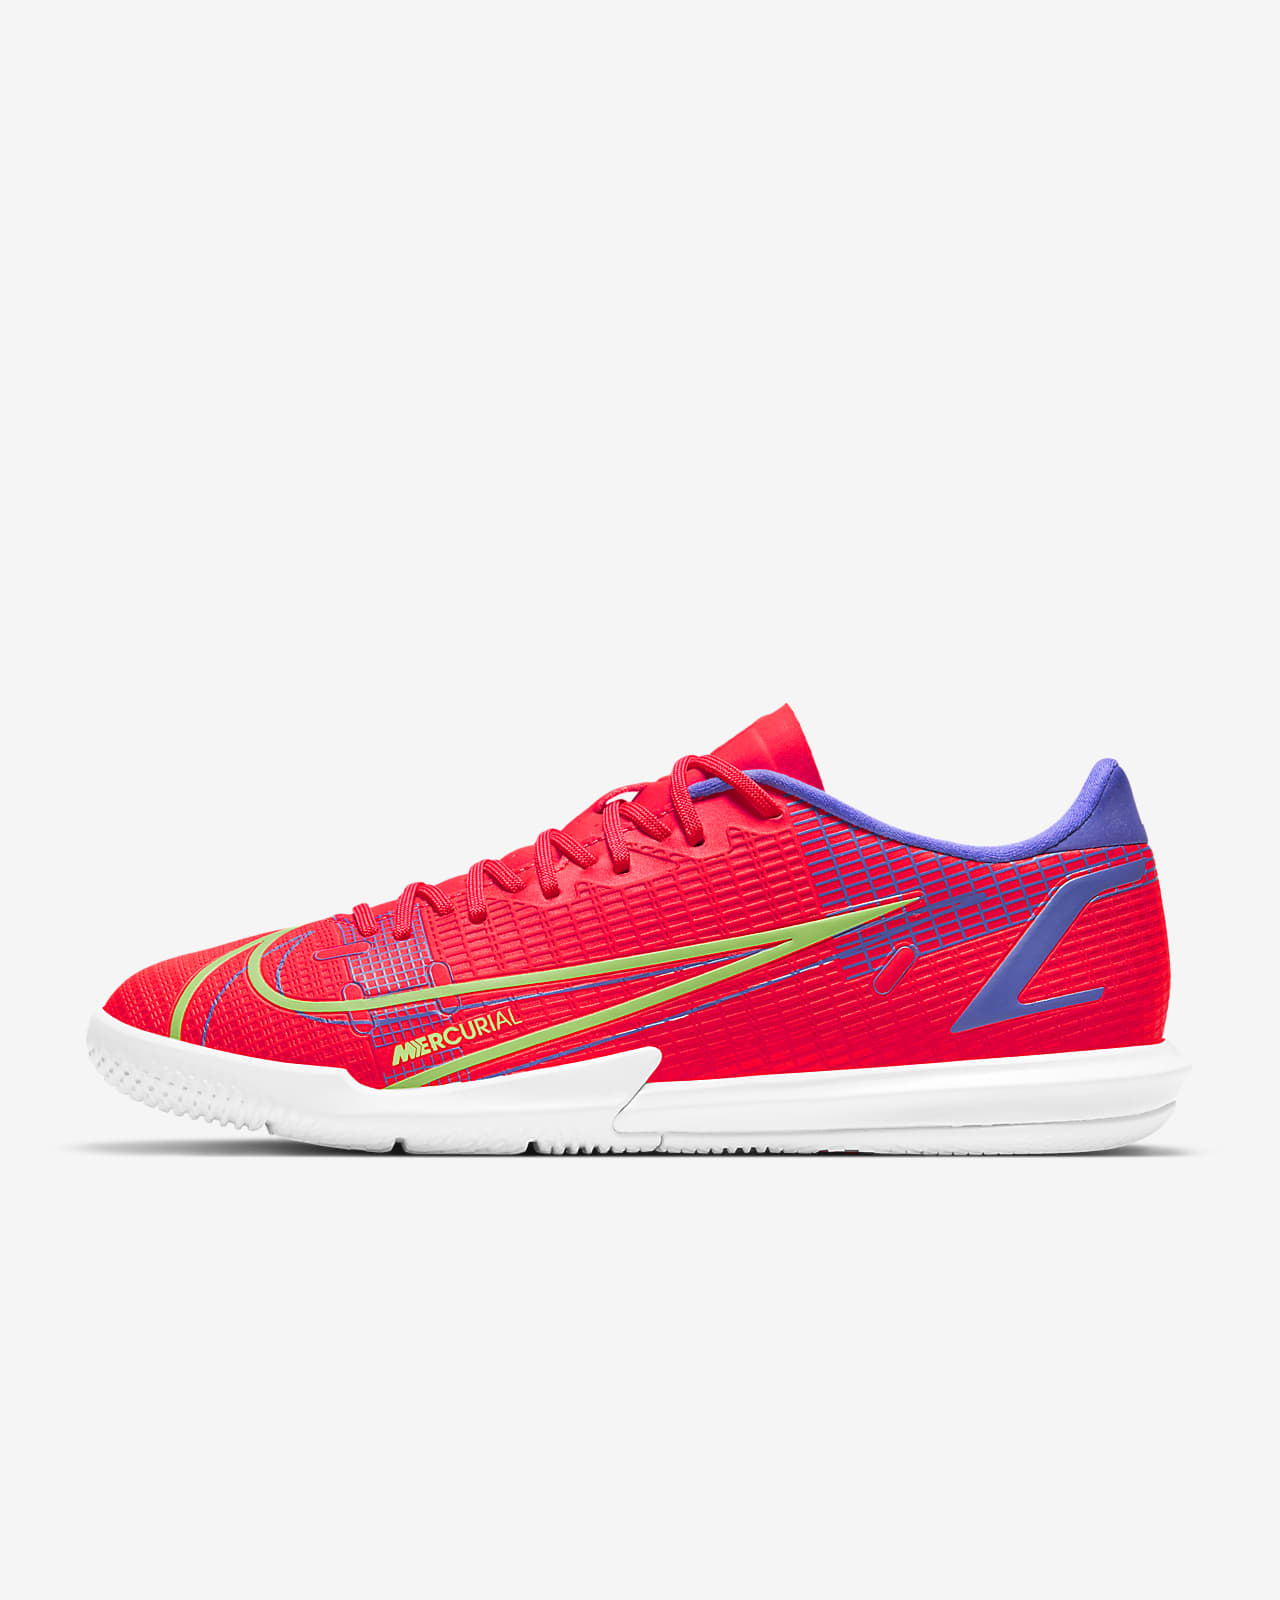 Nike Mercurial Vapor 14 Academy IC 體育館/路面足球鞋